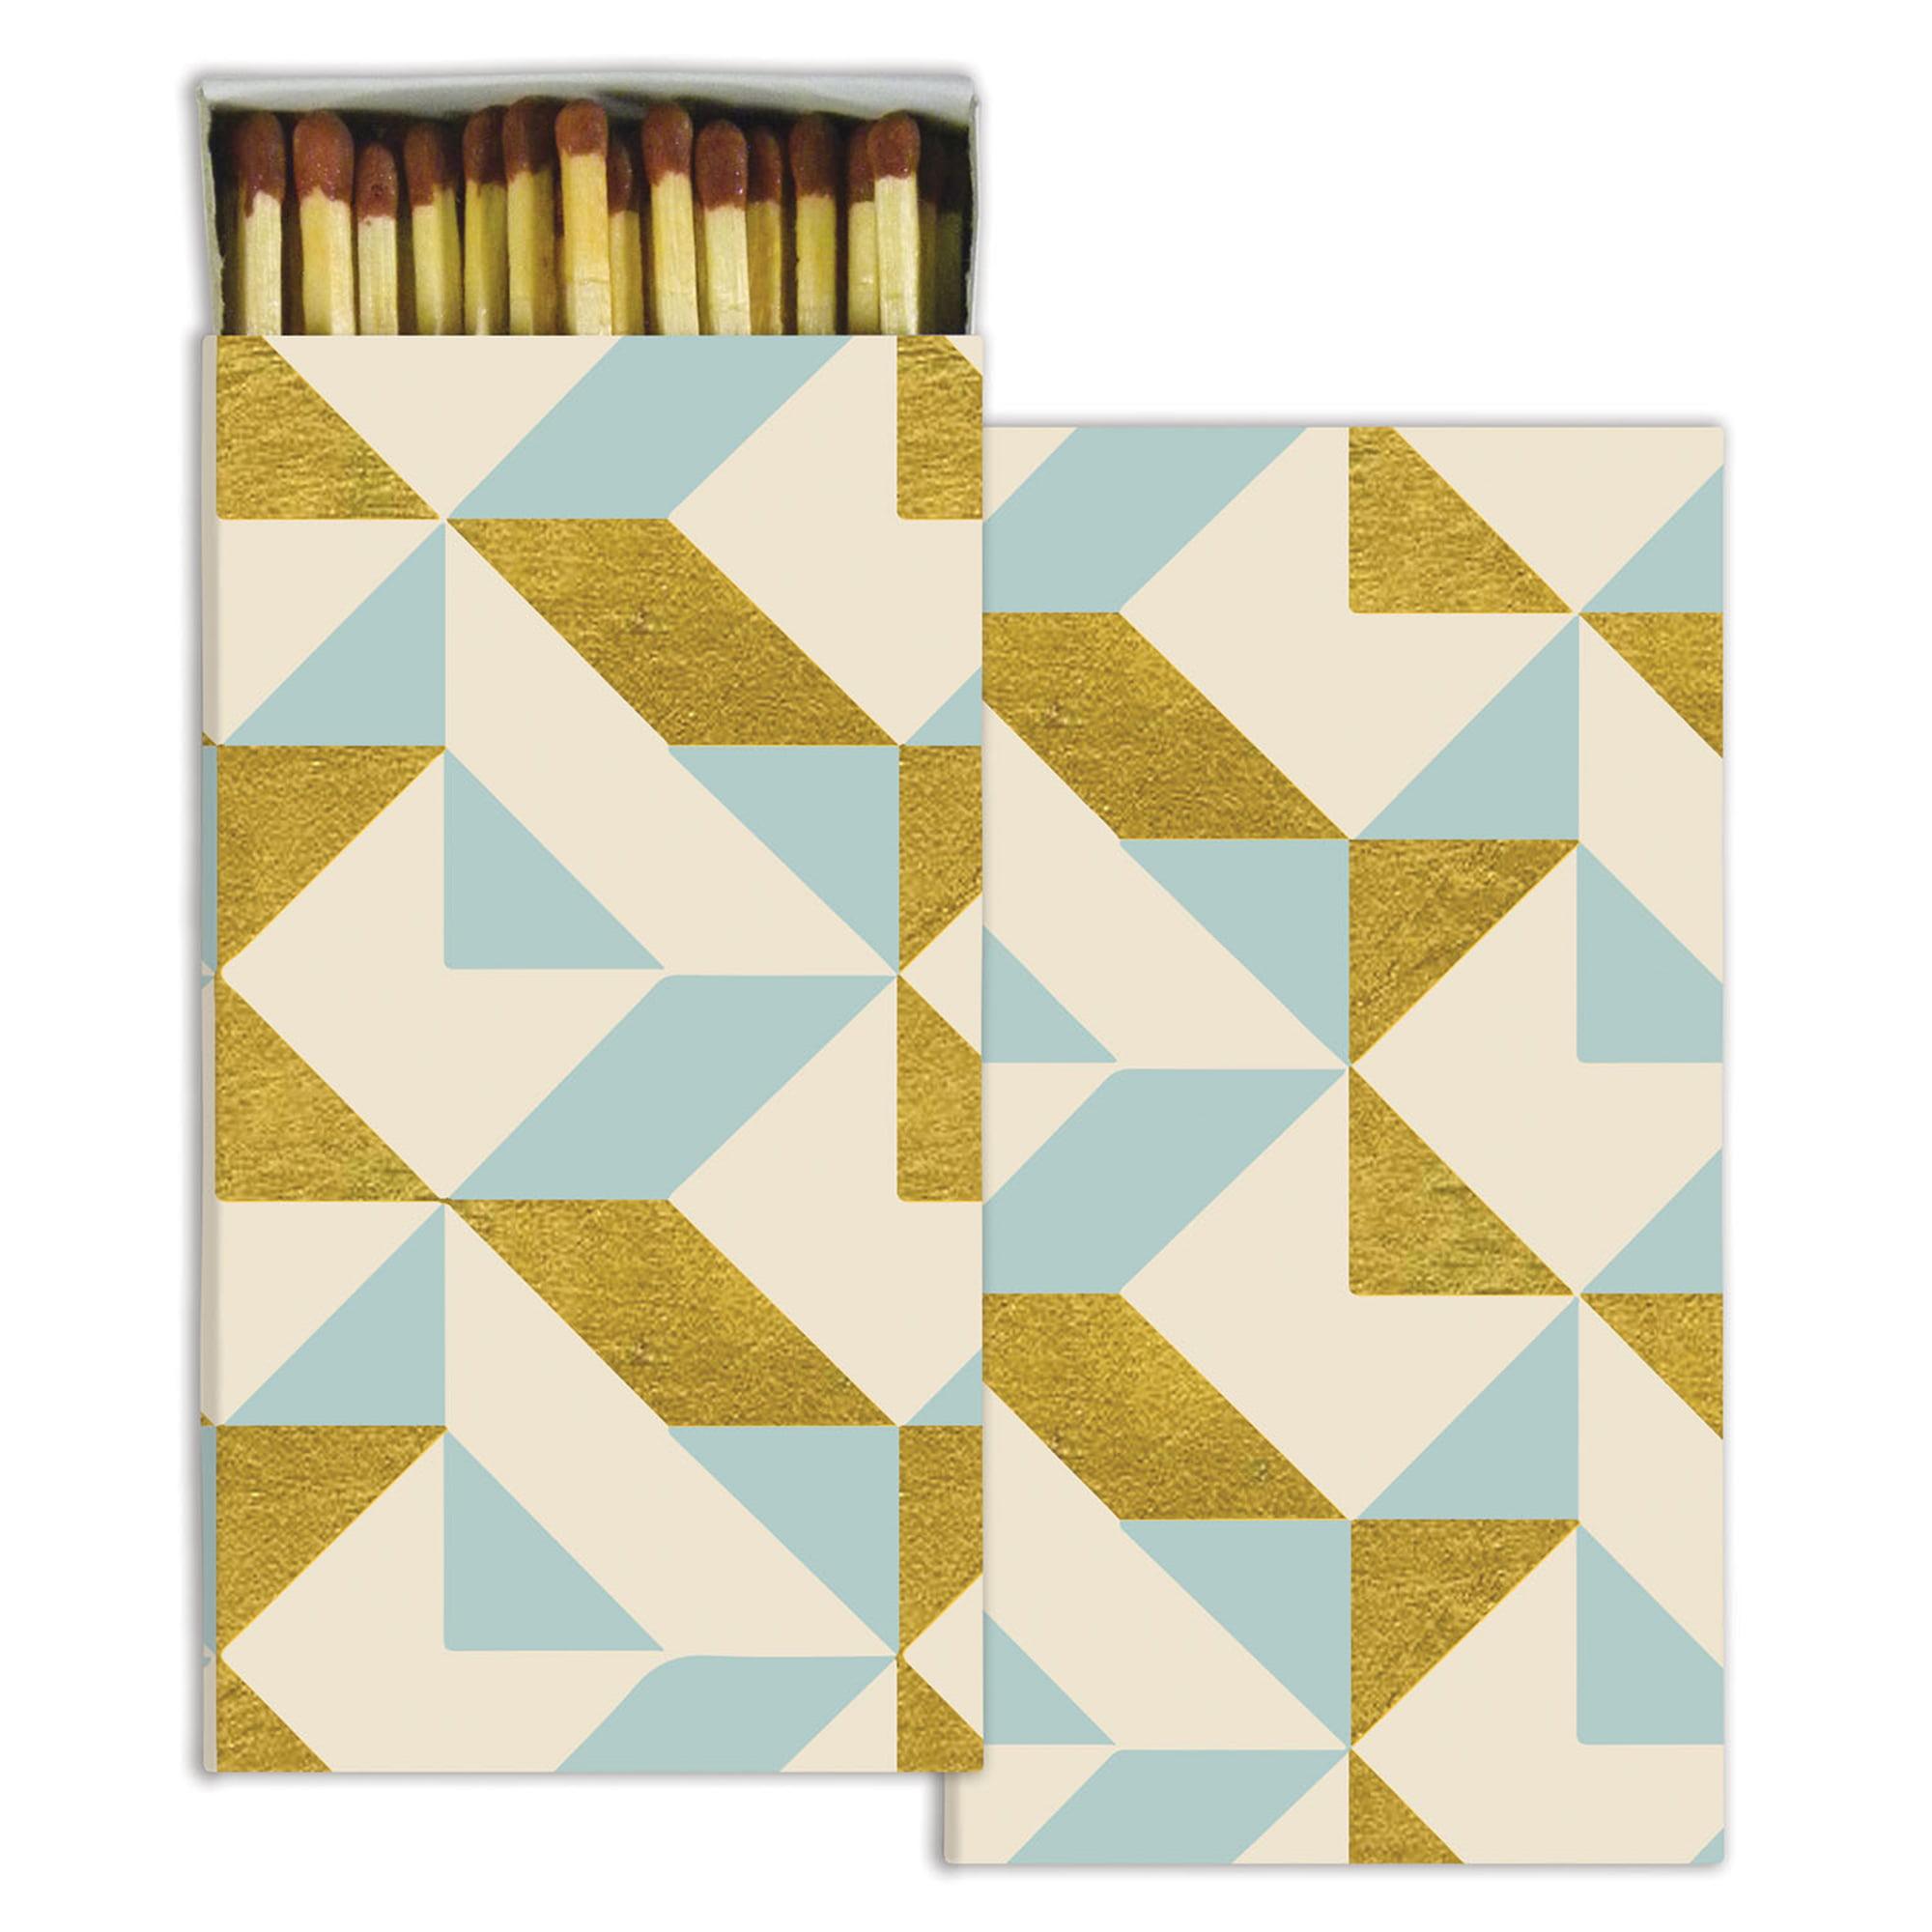 HomArt - Match Box Set of 2 - Colette Graphic - Gold Foil